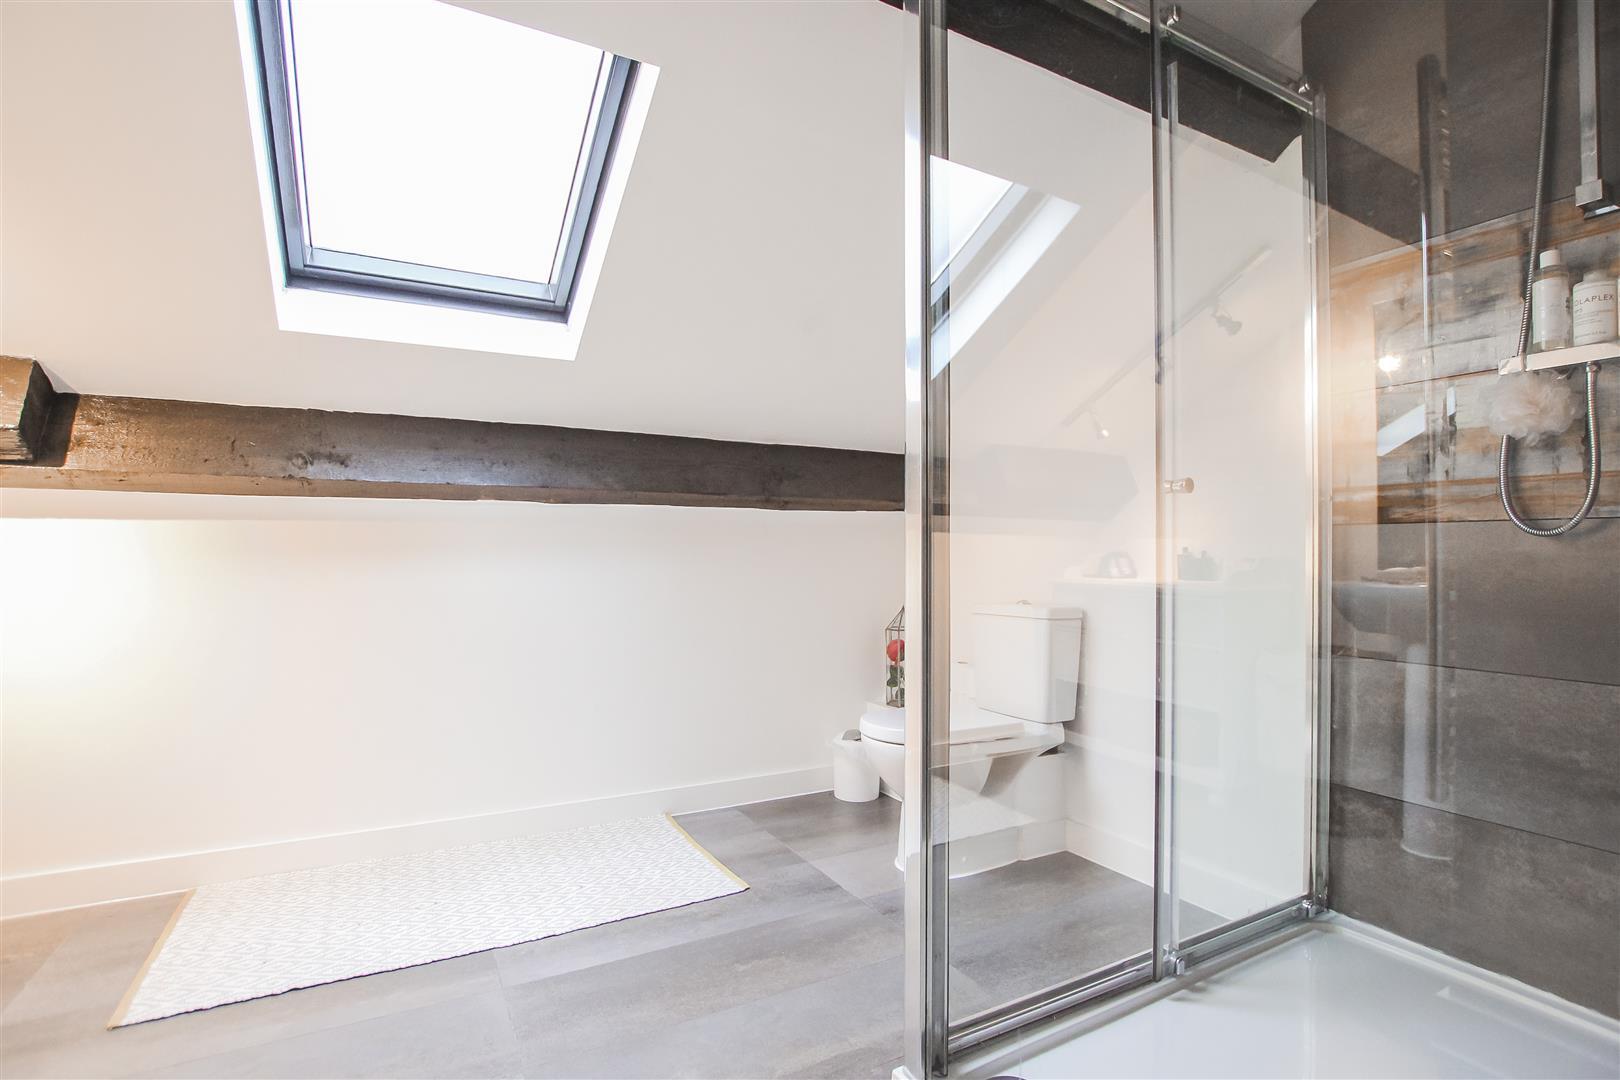 3 Bedroom Duplex Apartment For Sale - Image 57